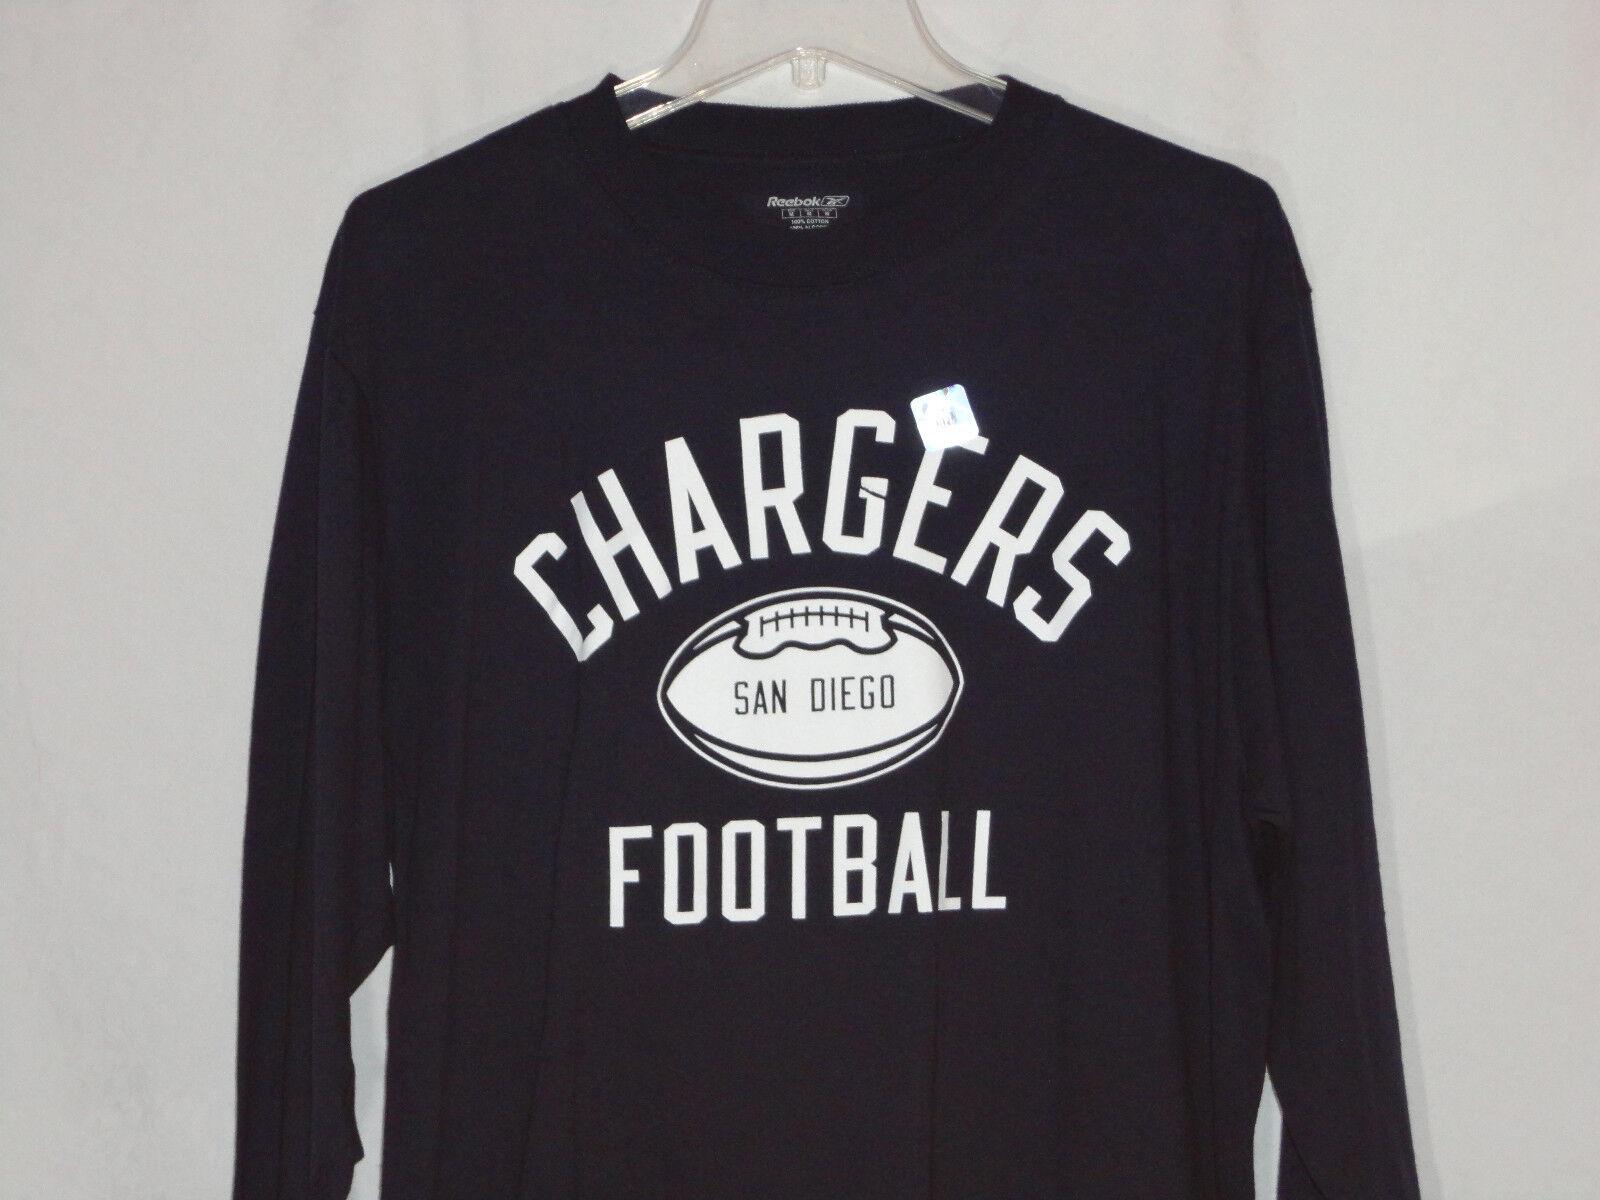 San Diego Chargers Langärmlig Reebok Shirt-Medium-Oops Super Fan Special Deal    Realistisch